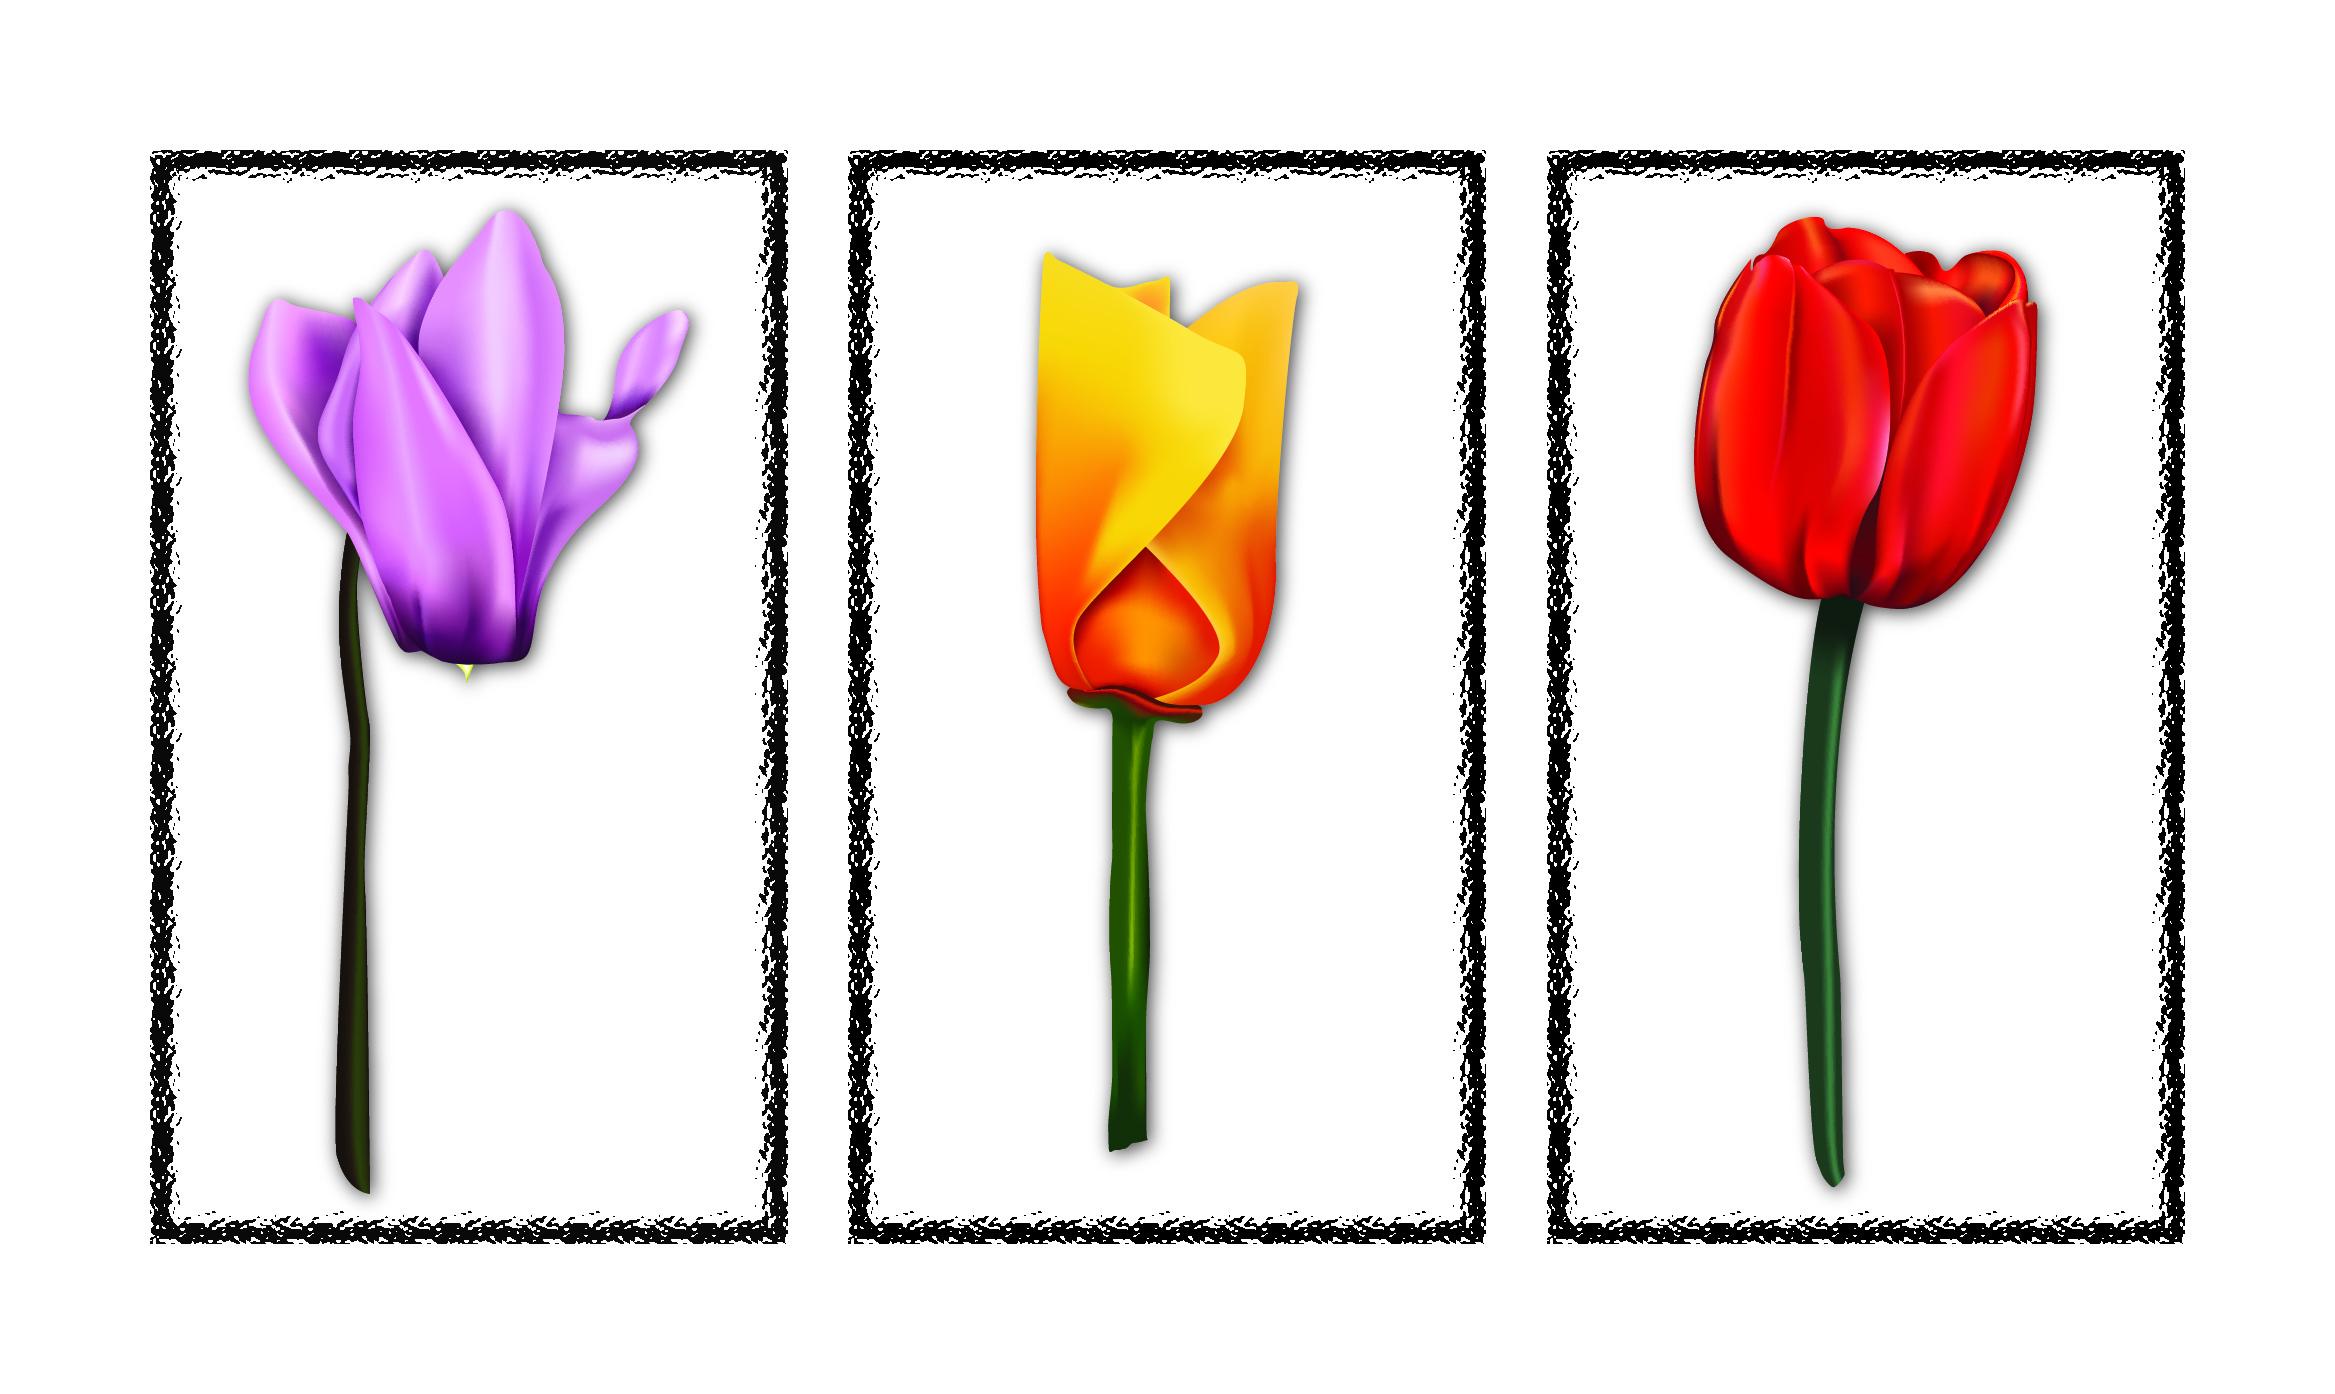 Ad Illustrator drawn flowers